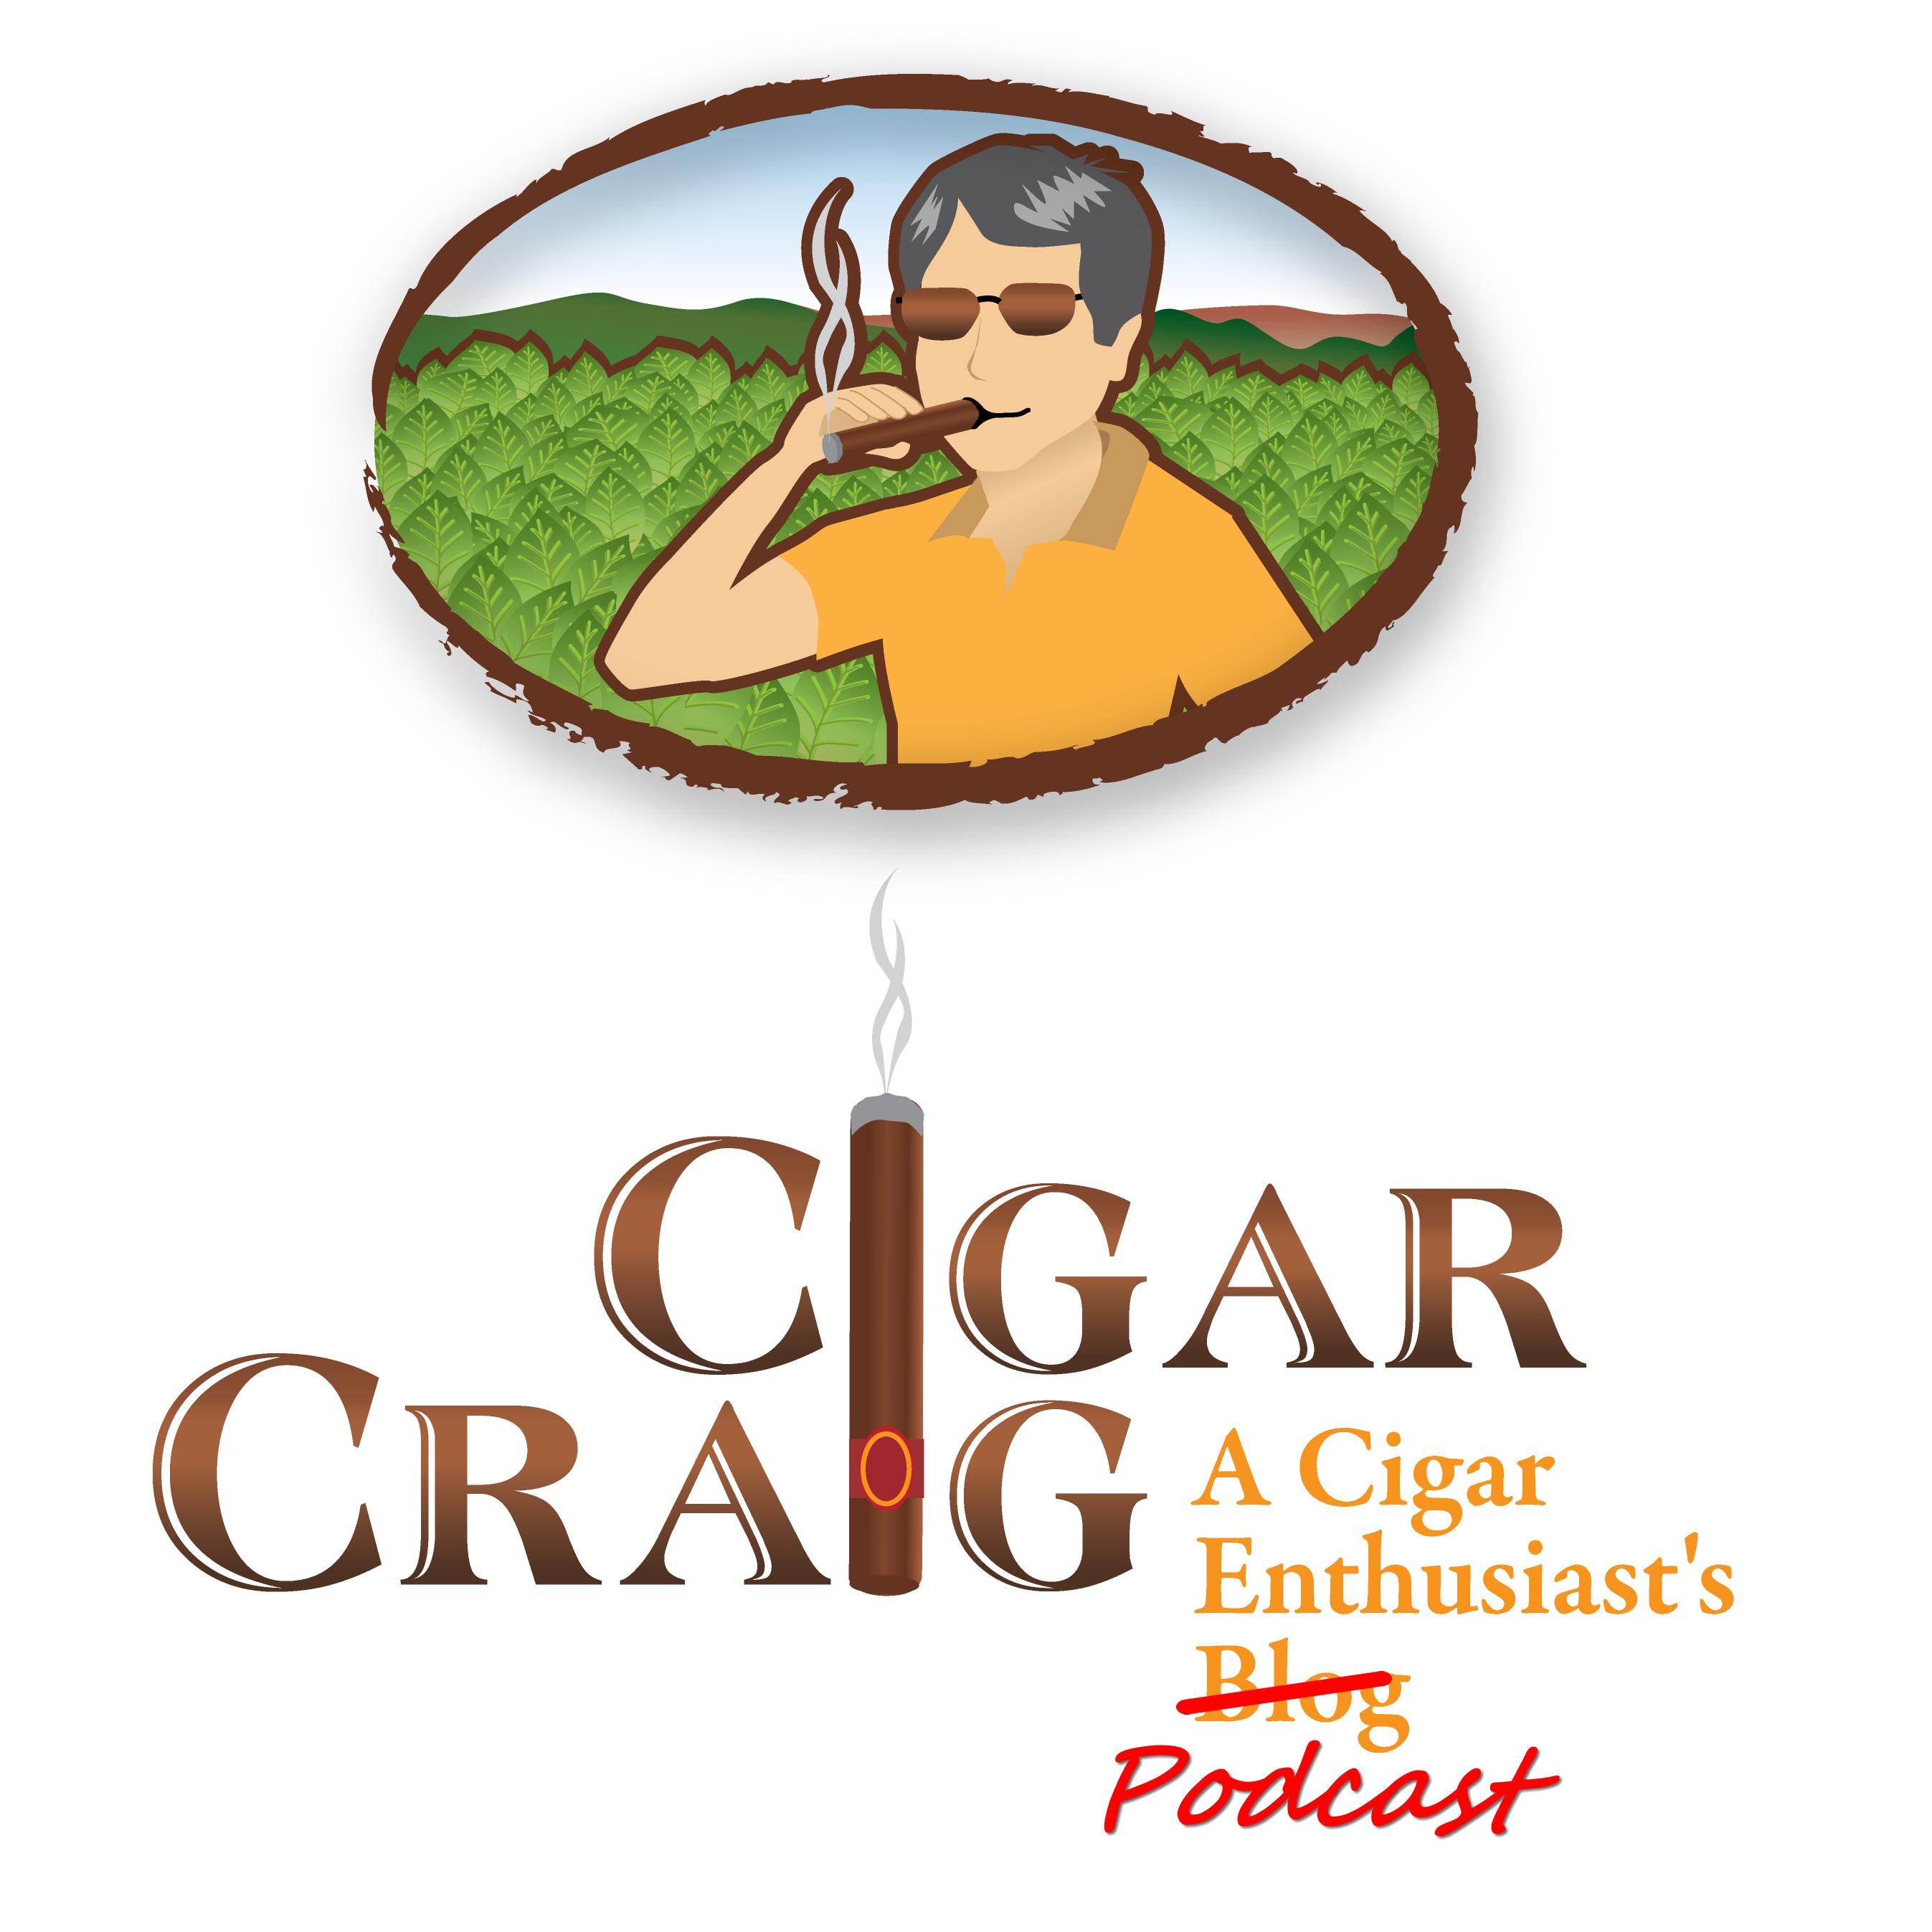 CigarCraig's Podcast show art